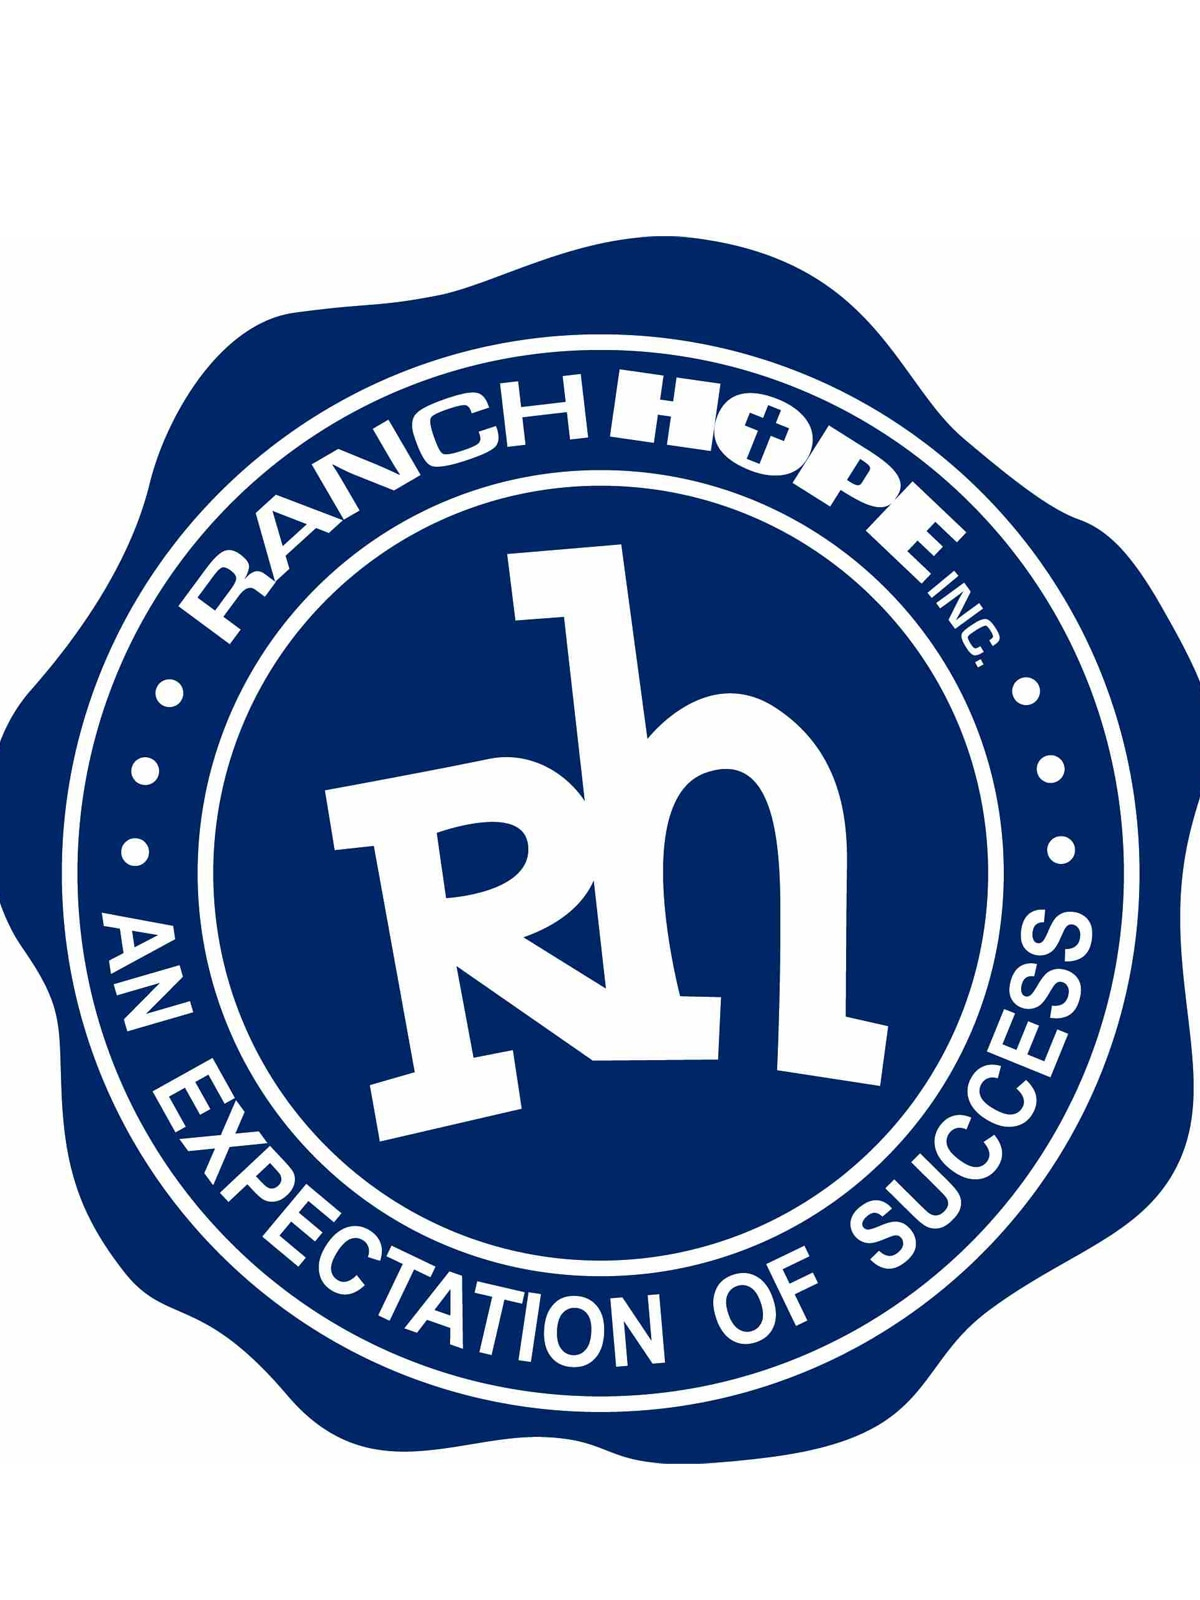 Ranch Hope